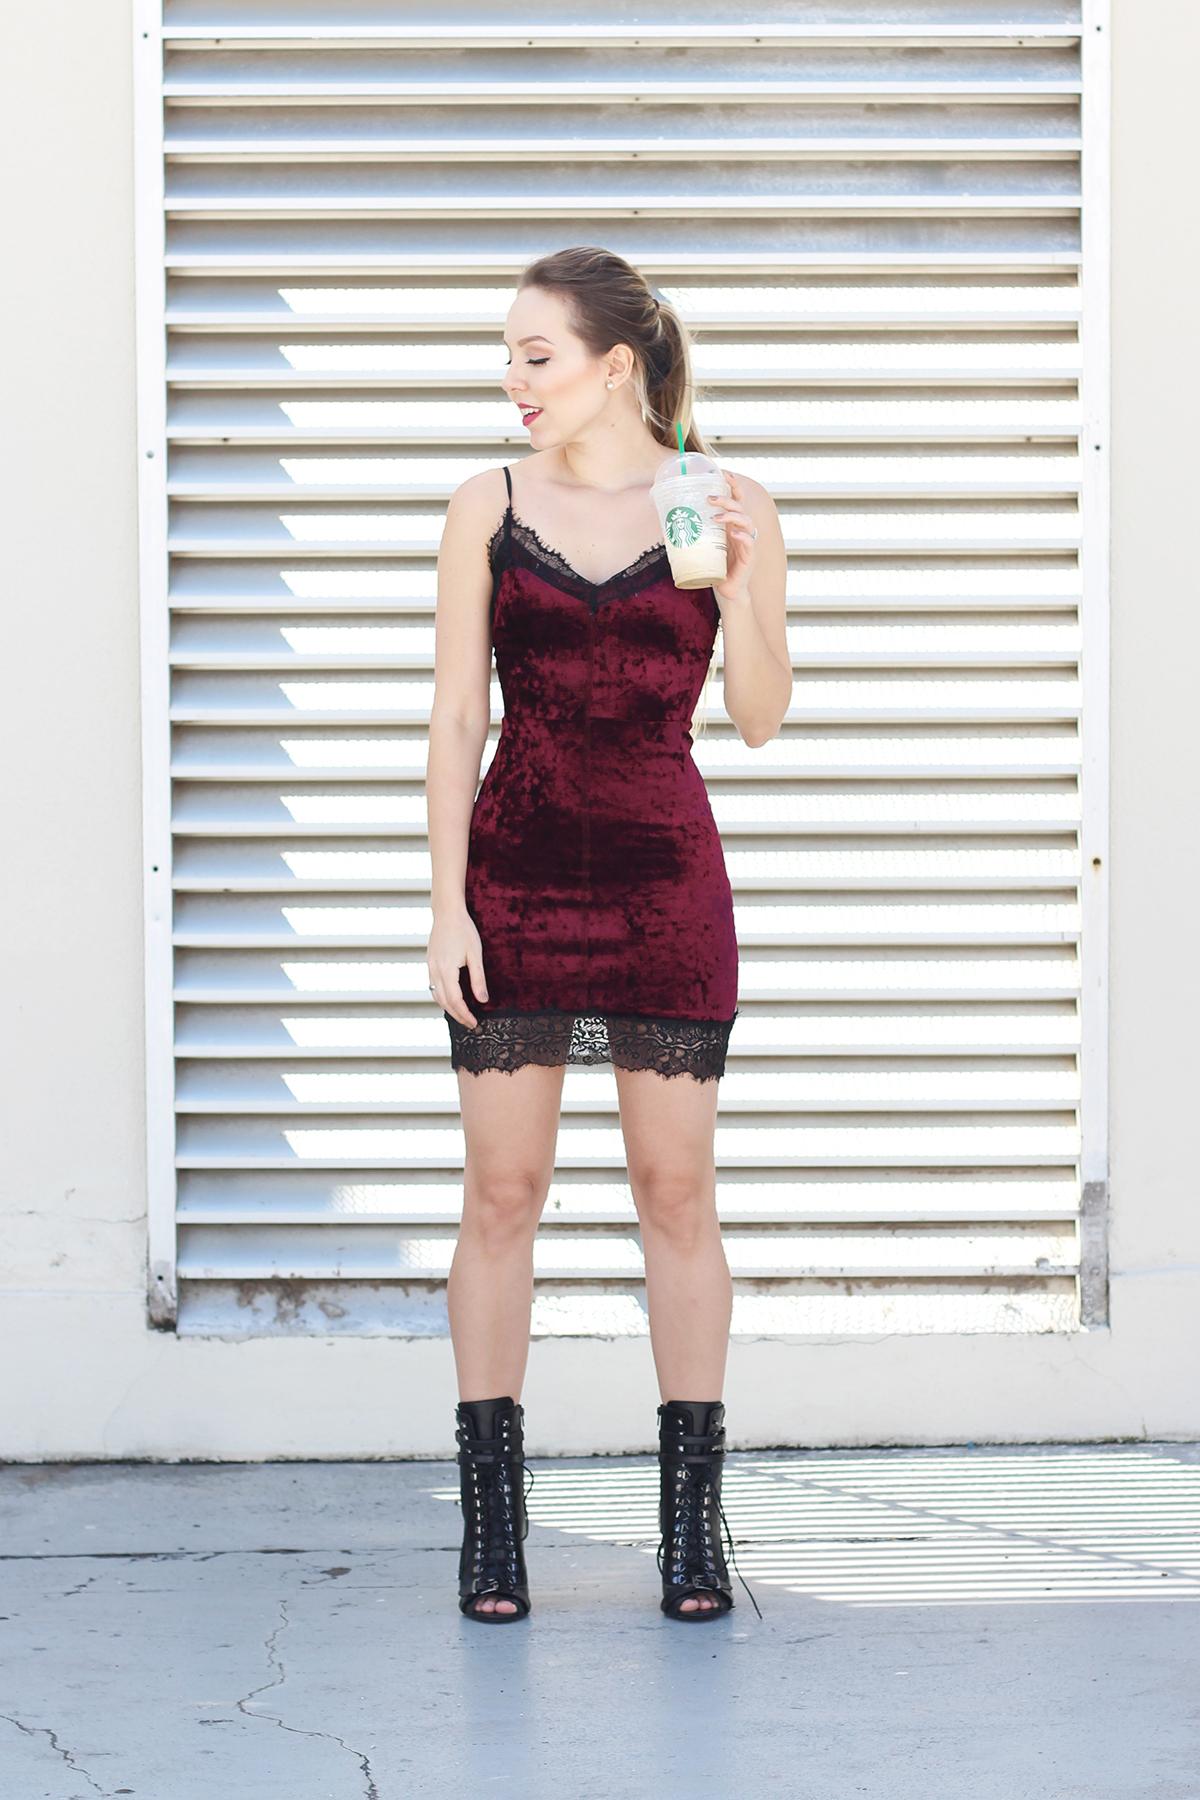 vestido de veludo e coturno 3